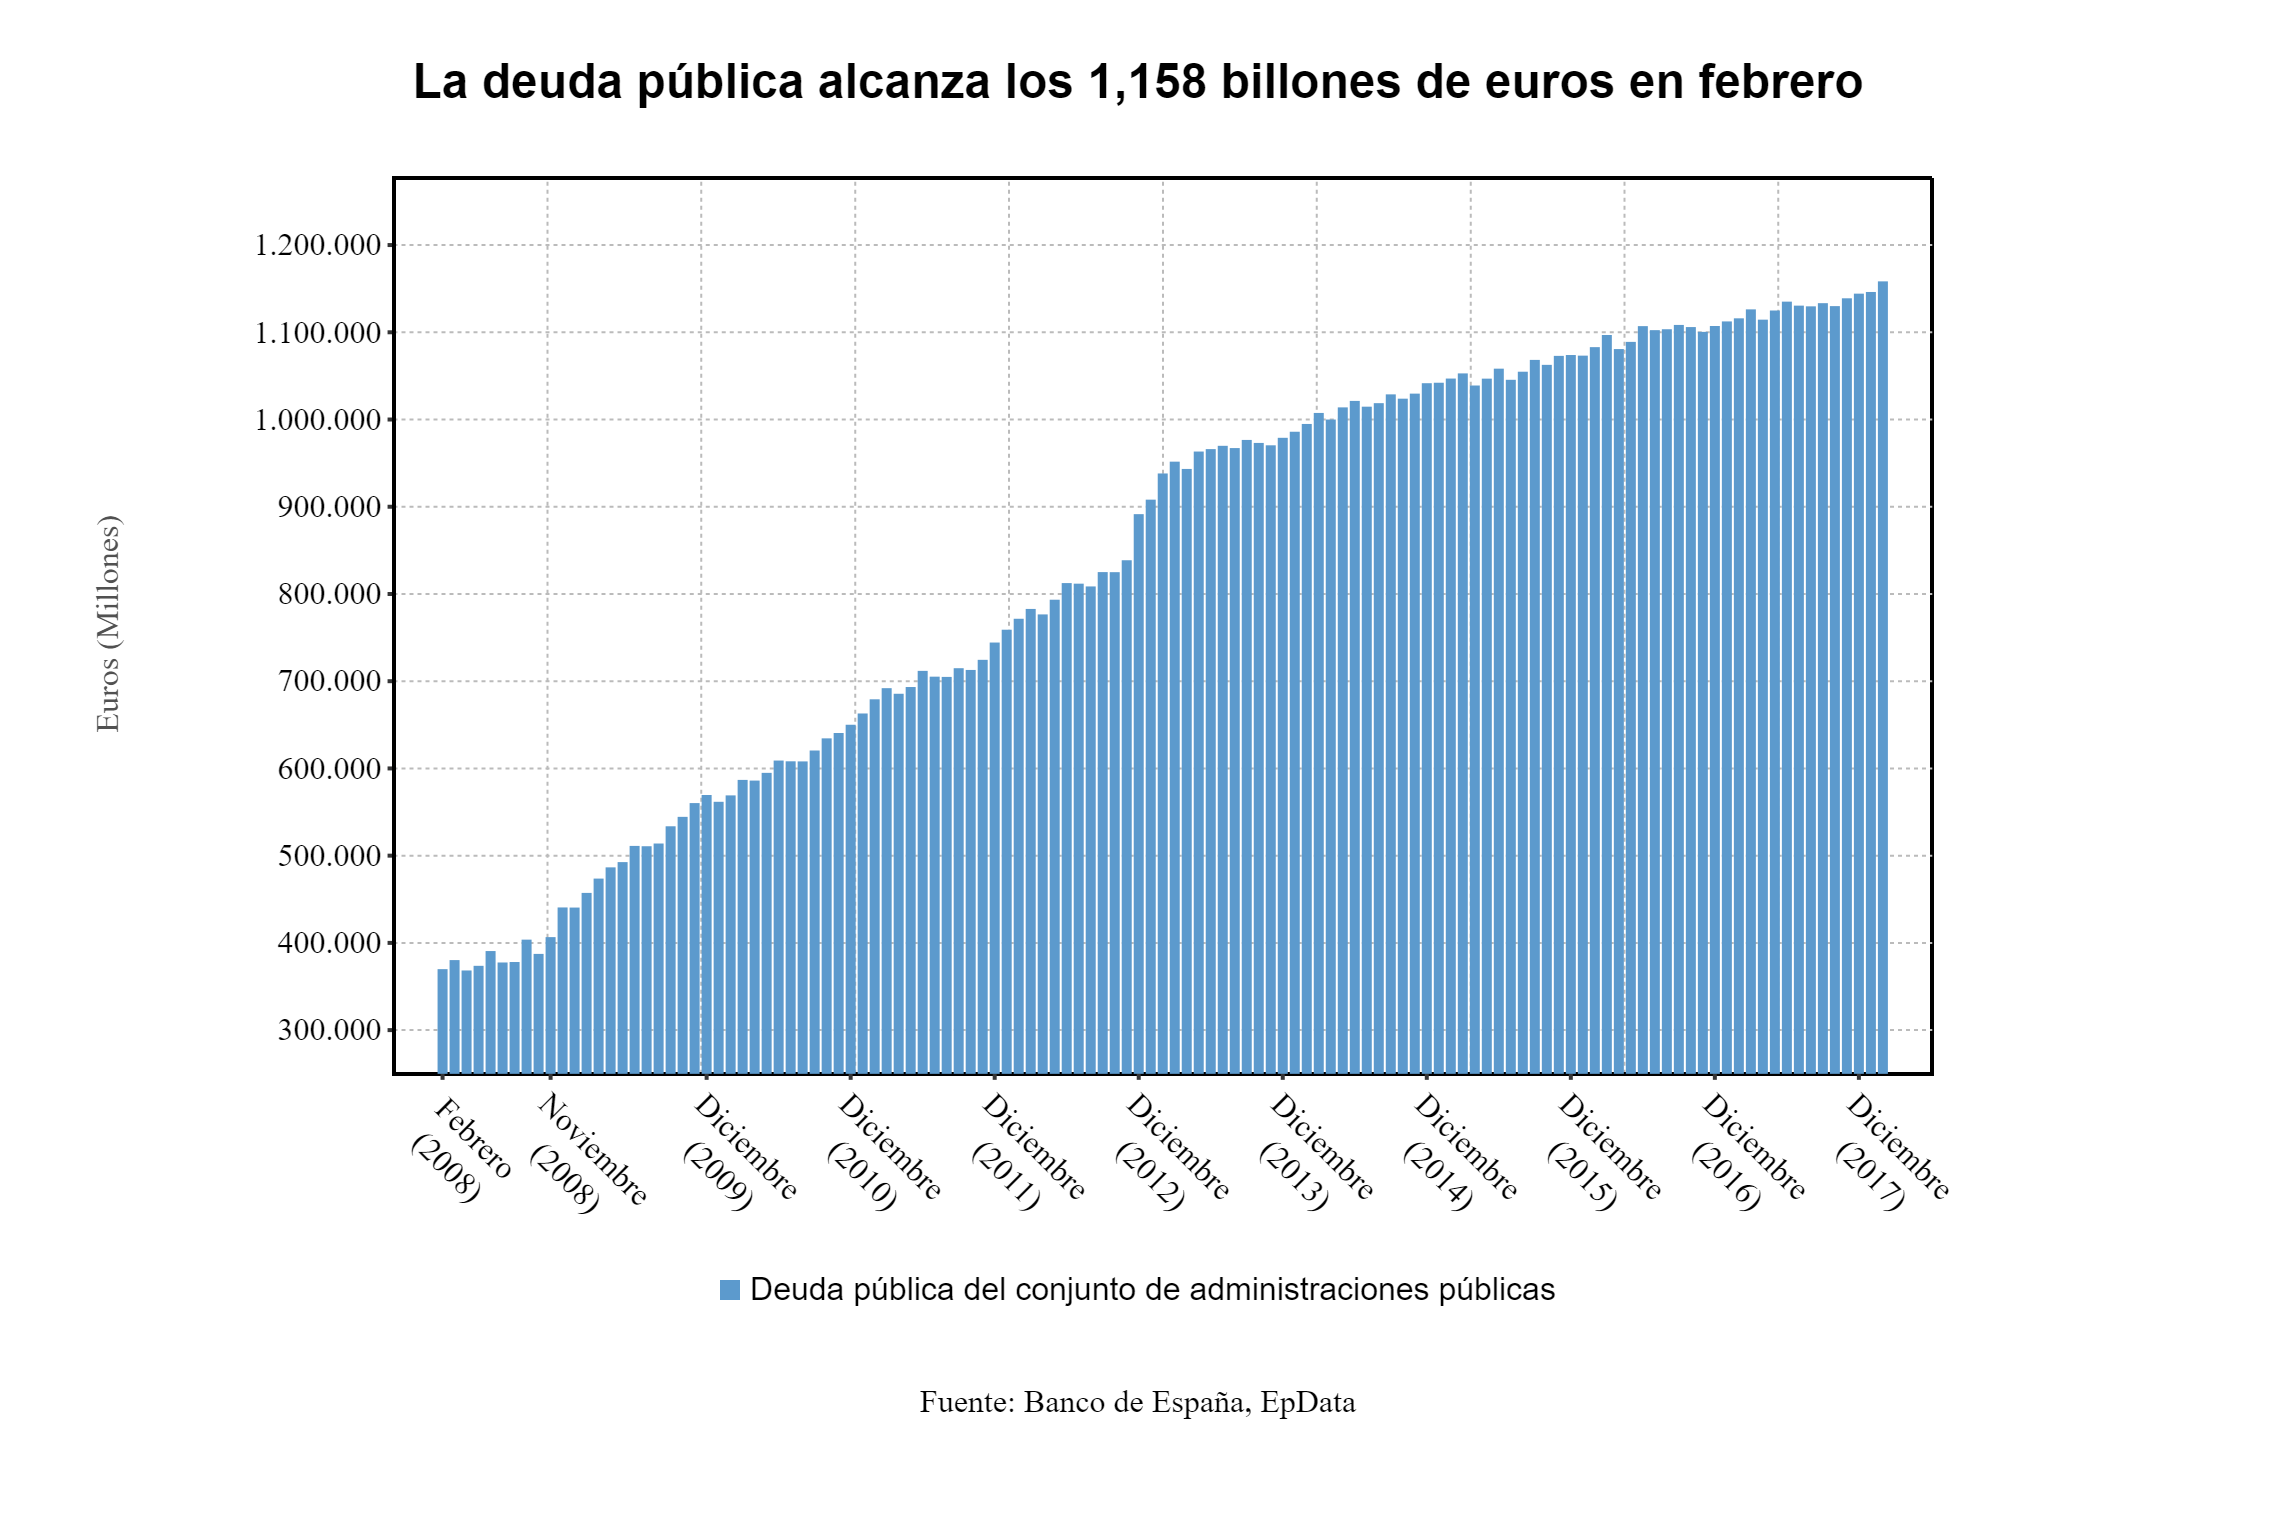 Europa Press Data